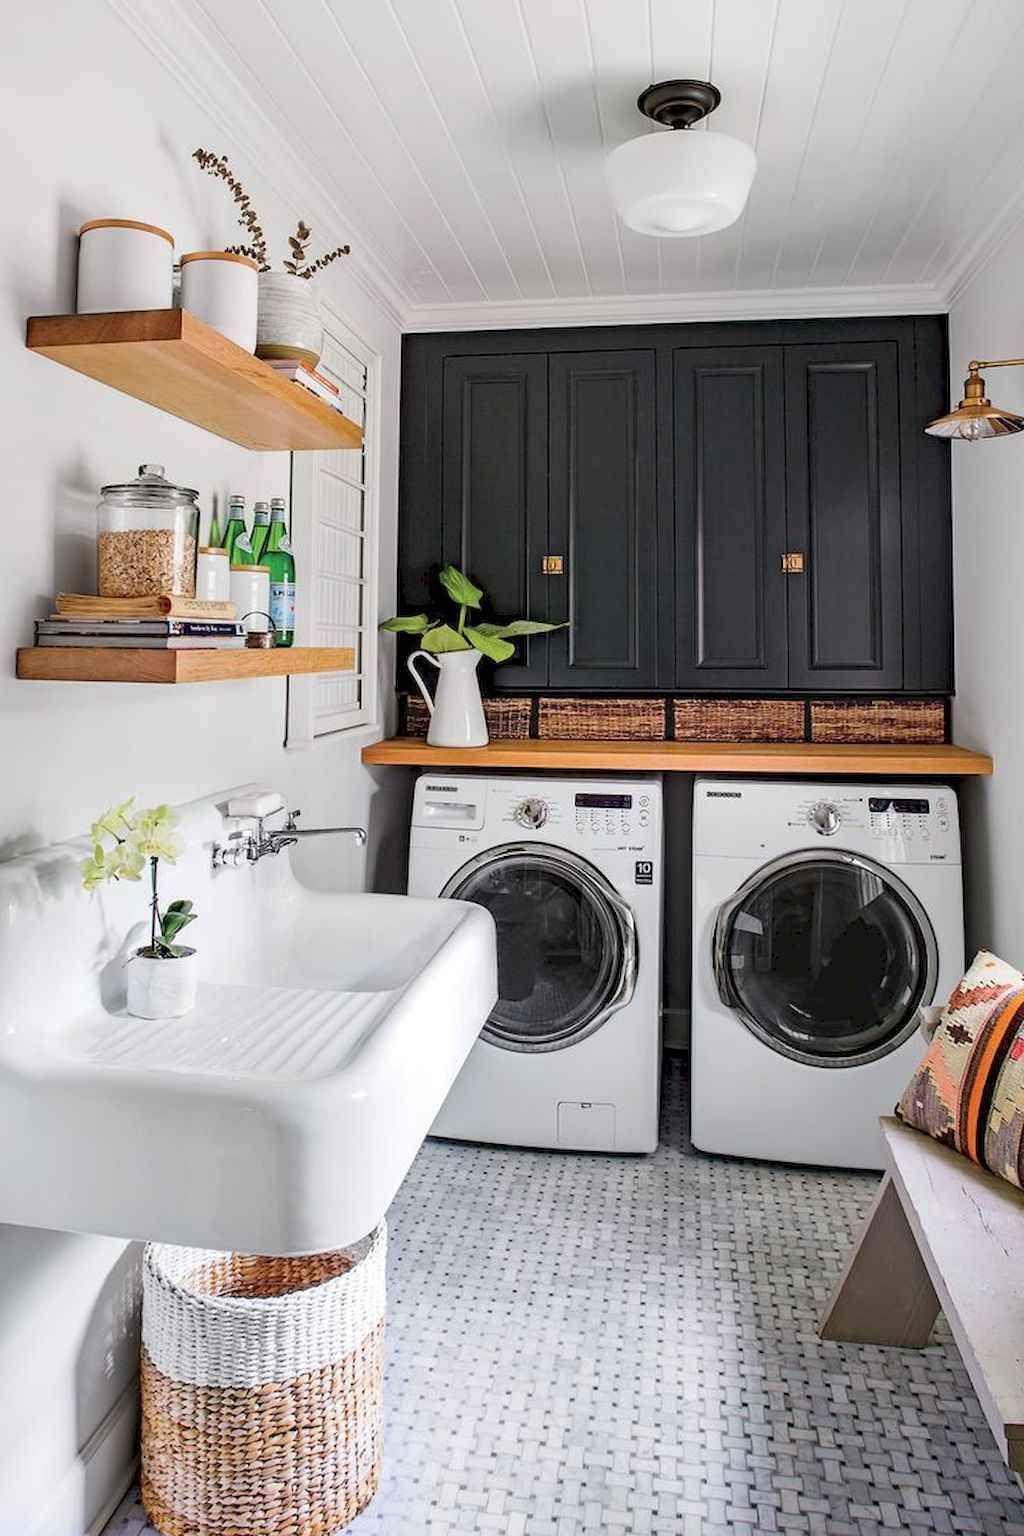 70 Amazing Farmhouse Laundry Room Decor Ideas | Farmhouse ... on Amazing Laundry Rooms  id=35581